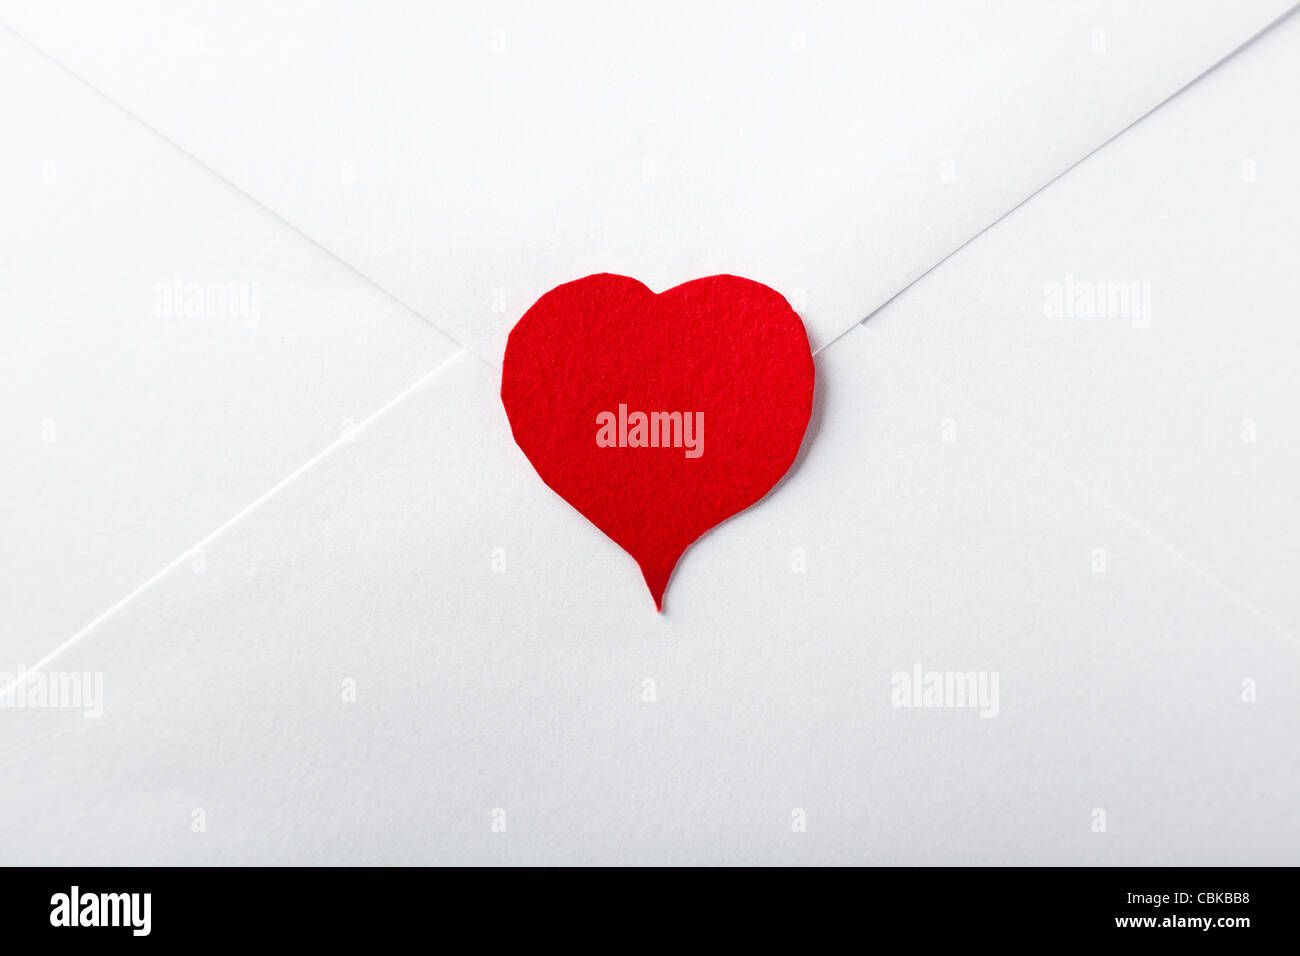 Red Paper Heart on White Envelope - Stock Image